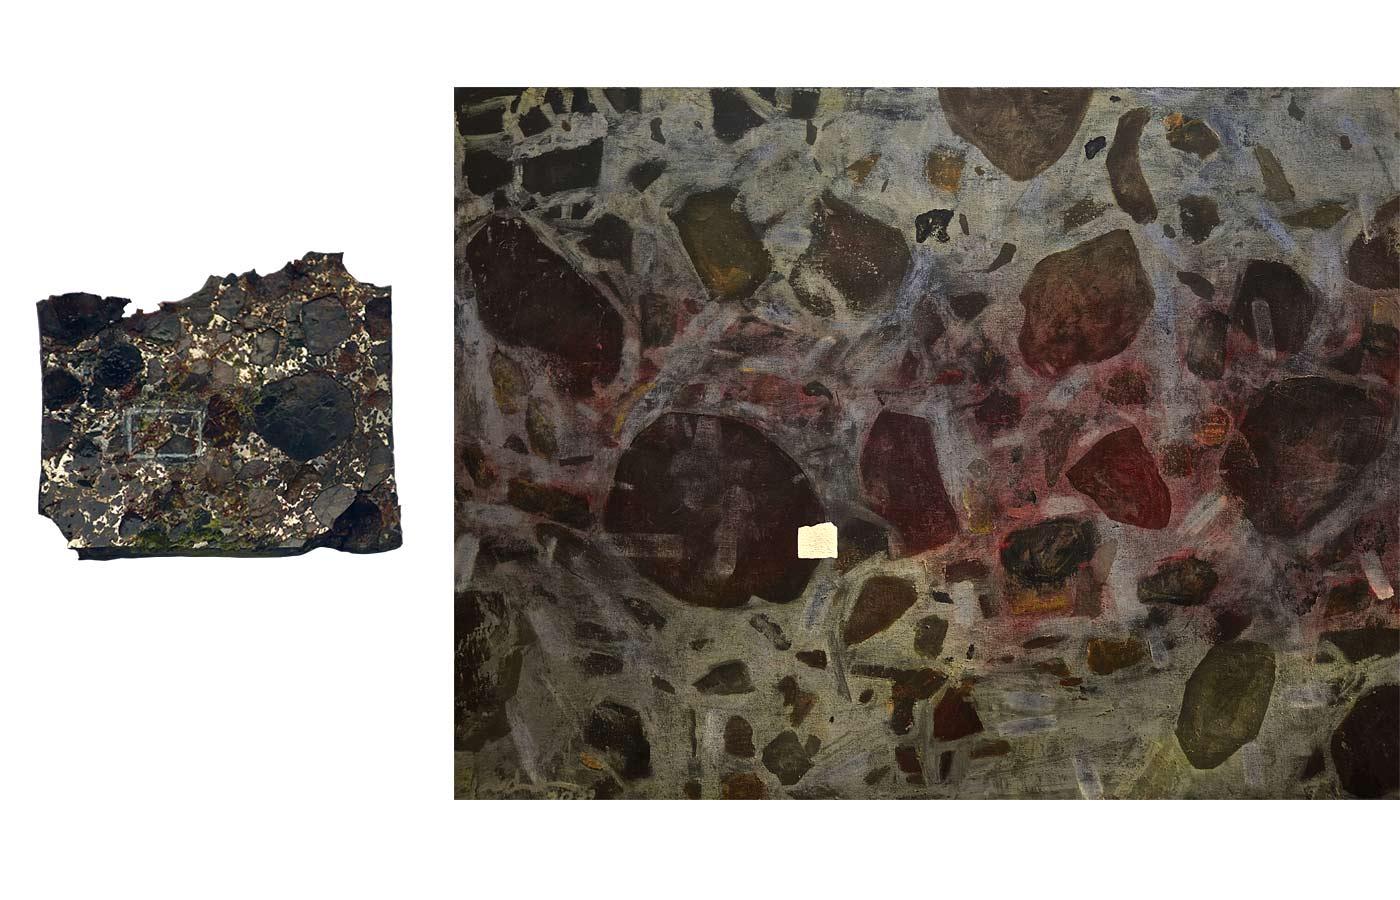 Segment of A Fragment